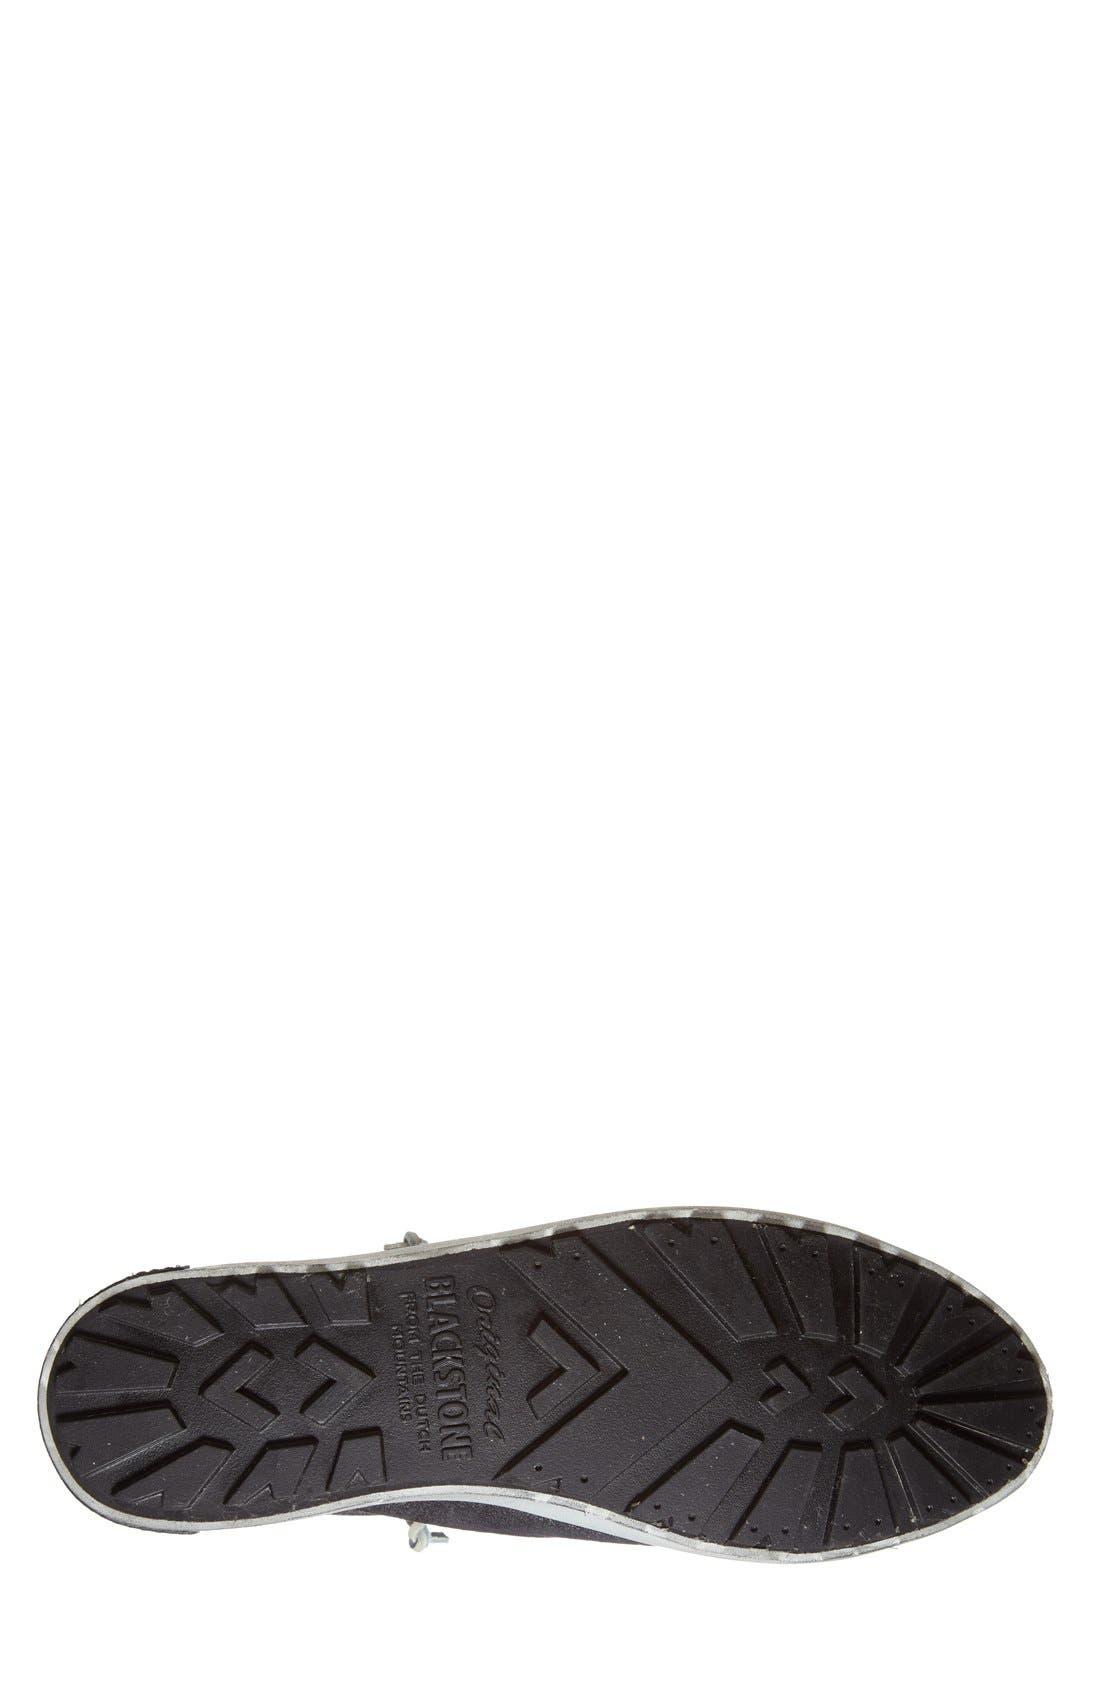 'JM 02' High Top Sneaker,                             Alternate thumbnail 4, color,